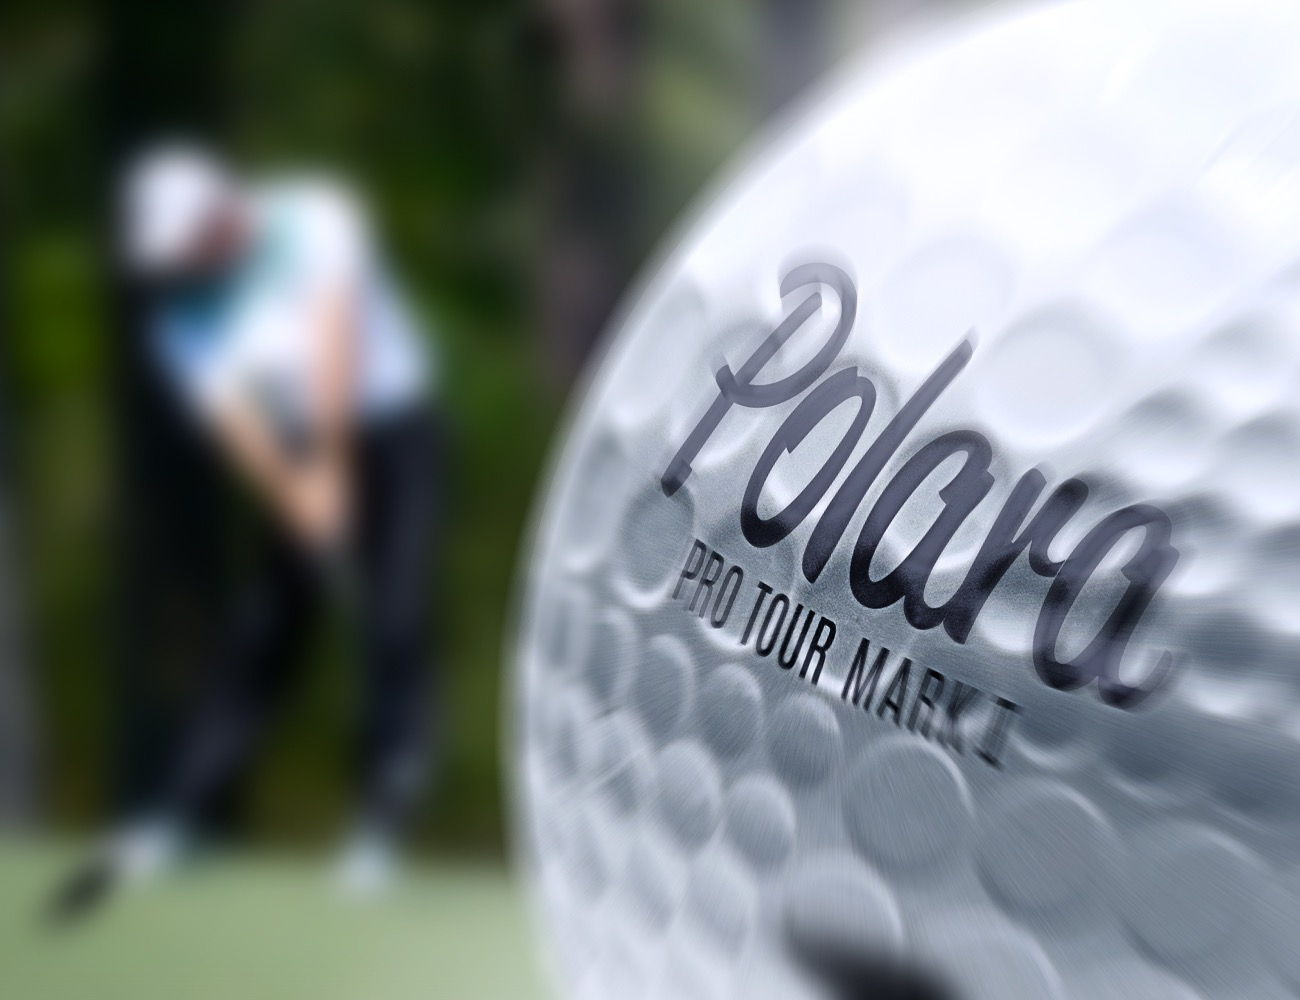 Polara+Pro+Tour+FS+Mark+I+%26%238211%3B+The+Biggest+Golf+Ball+Innovation+In+Decades%21